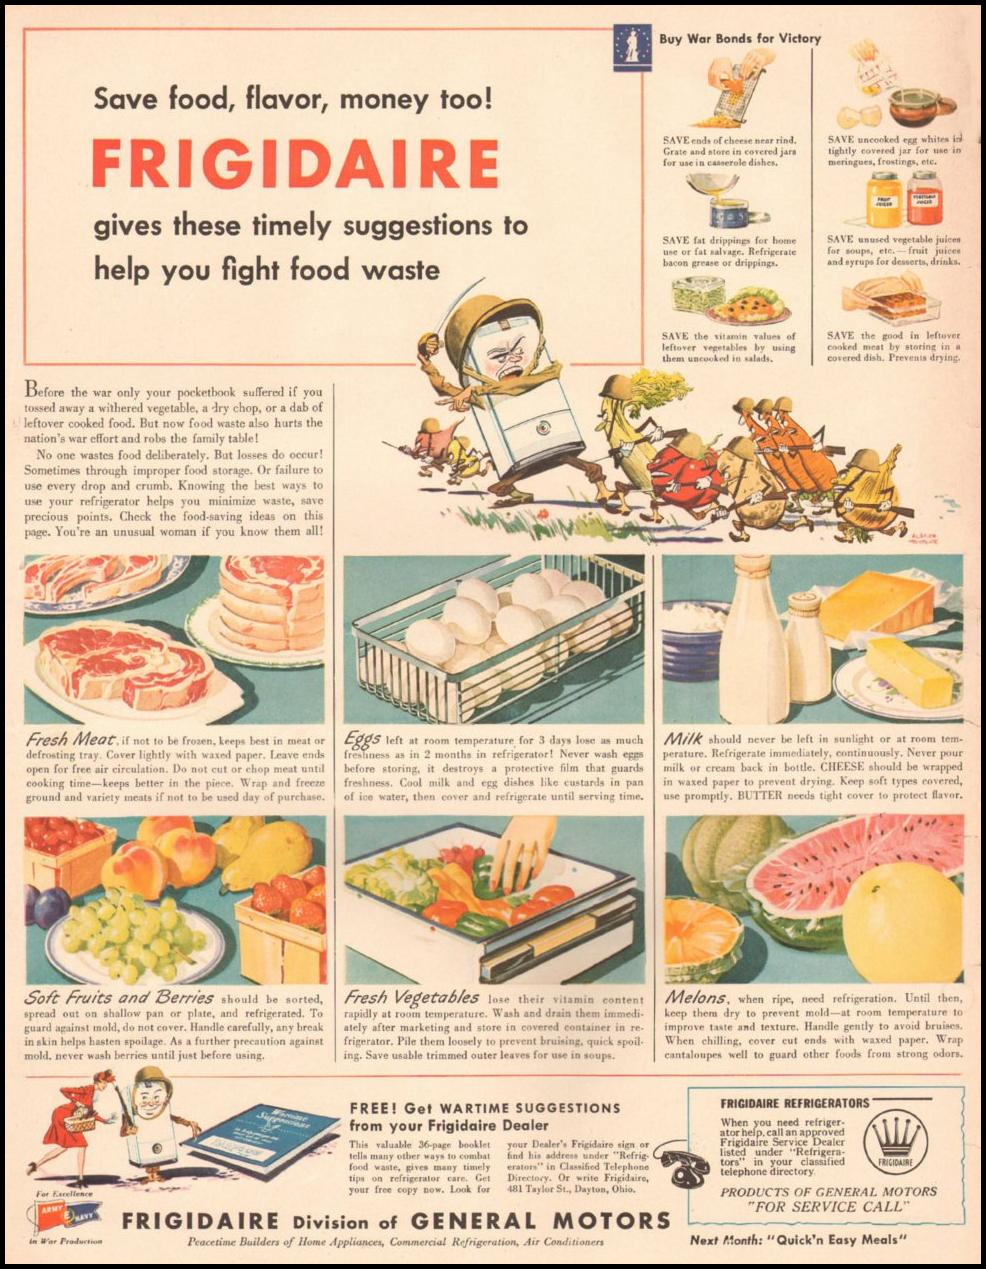 FRIGIDAIRE REFRIGERATORS LIFE 08/09/1943